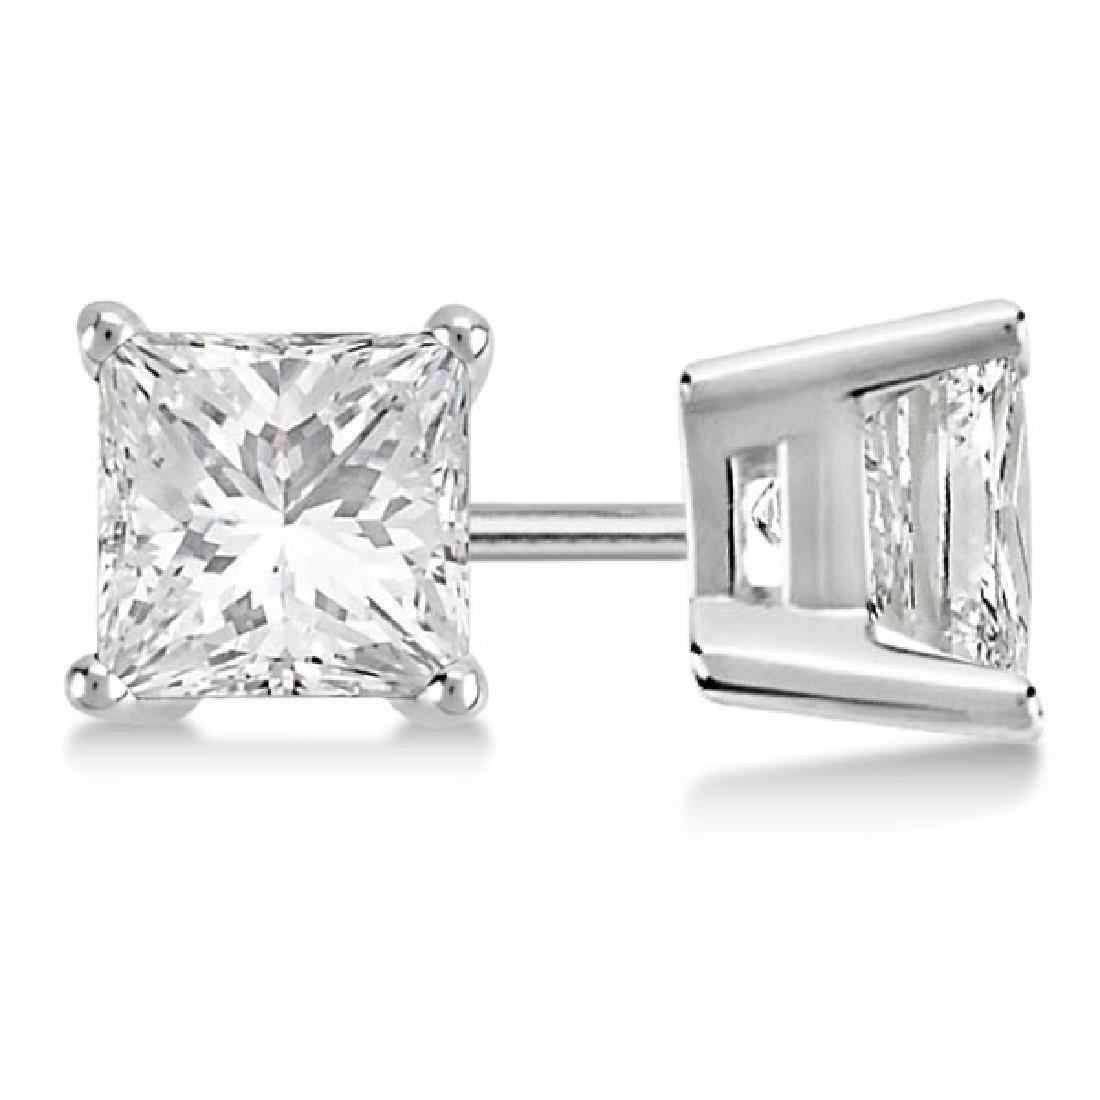 Certified 1.04 CTW Princess Diamond Stud Earrings E/SI1